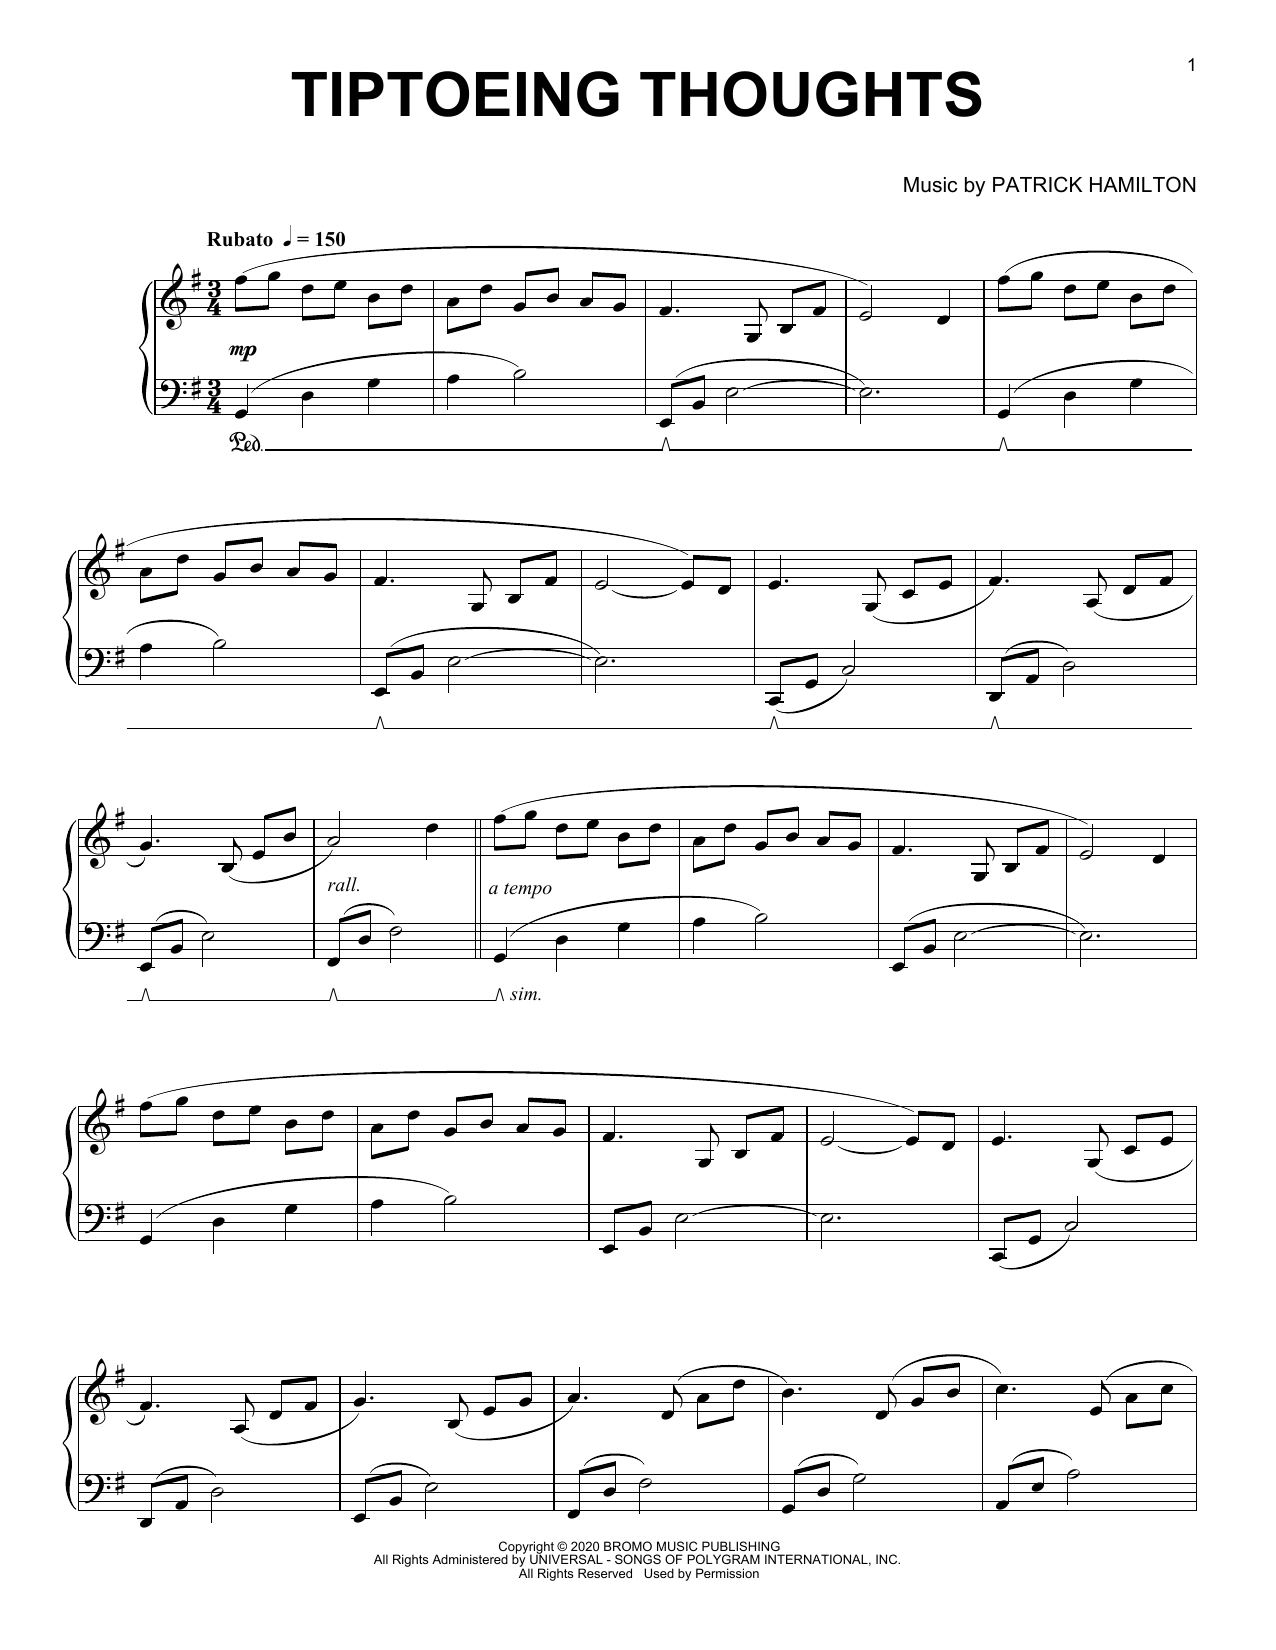 Patrick Hamilton Tiptoeing thoughts sheet music notes printable PDF score